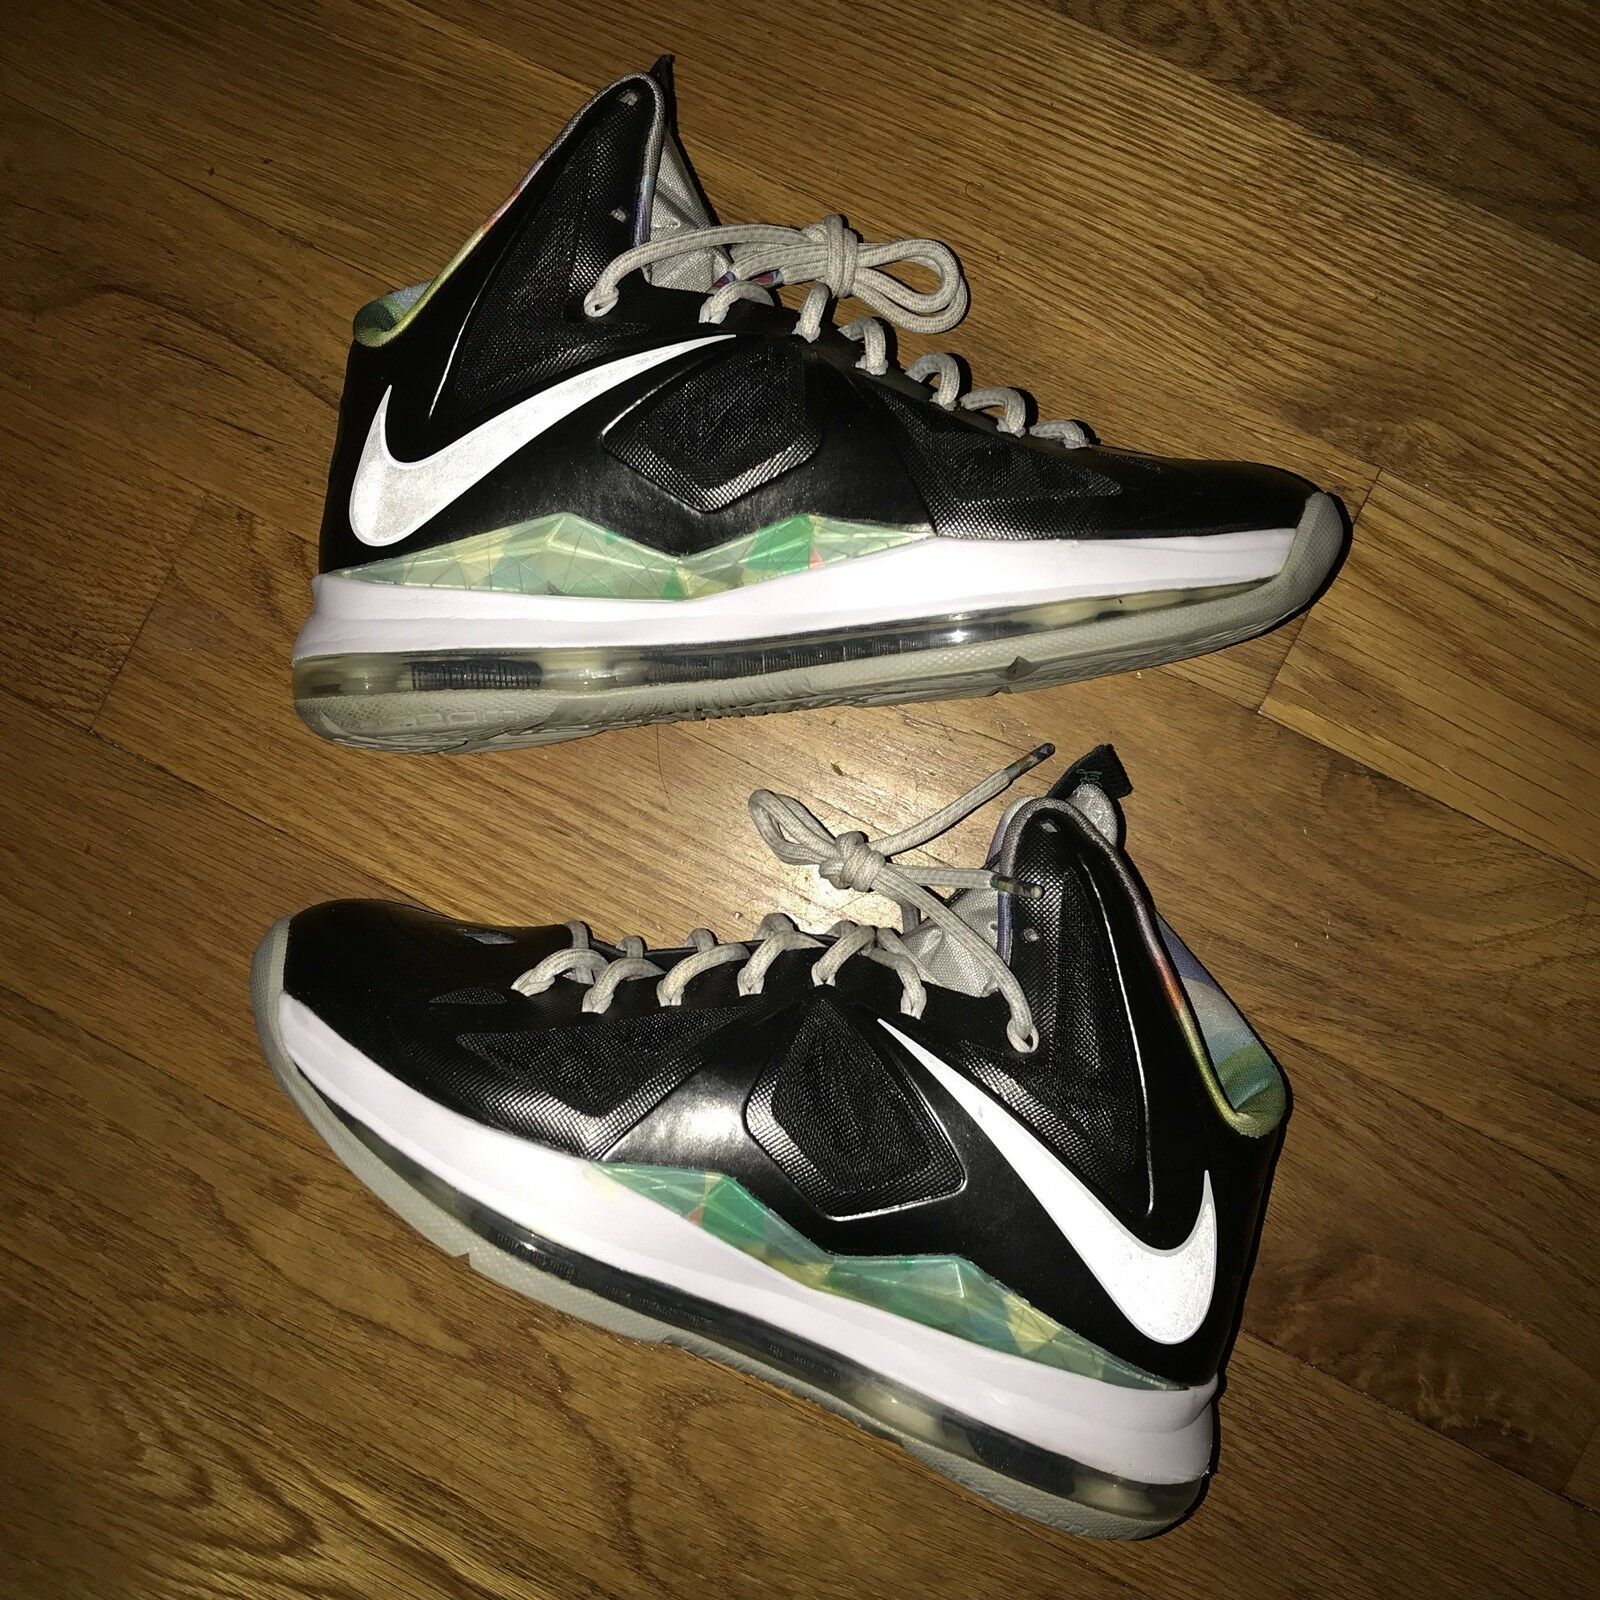 bdbfdd7a Nike Lebron 10 Prism Men Size 8.5 10 rare.yeezy.boost.350 X Women  noqrib7537-Athletic Shoes